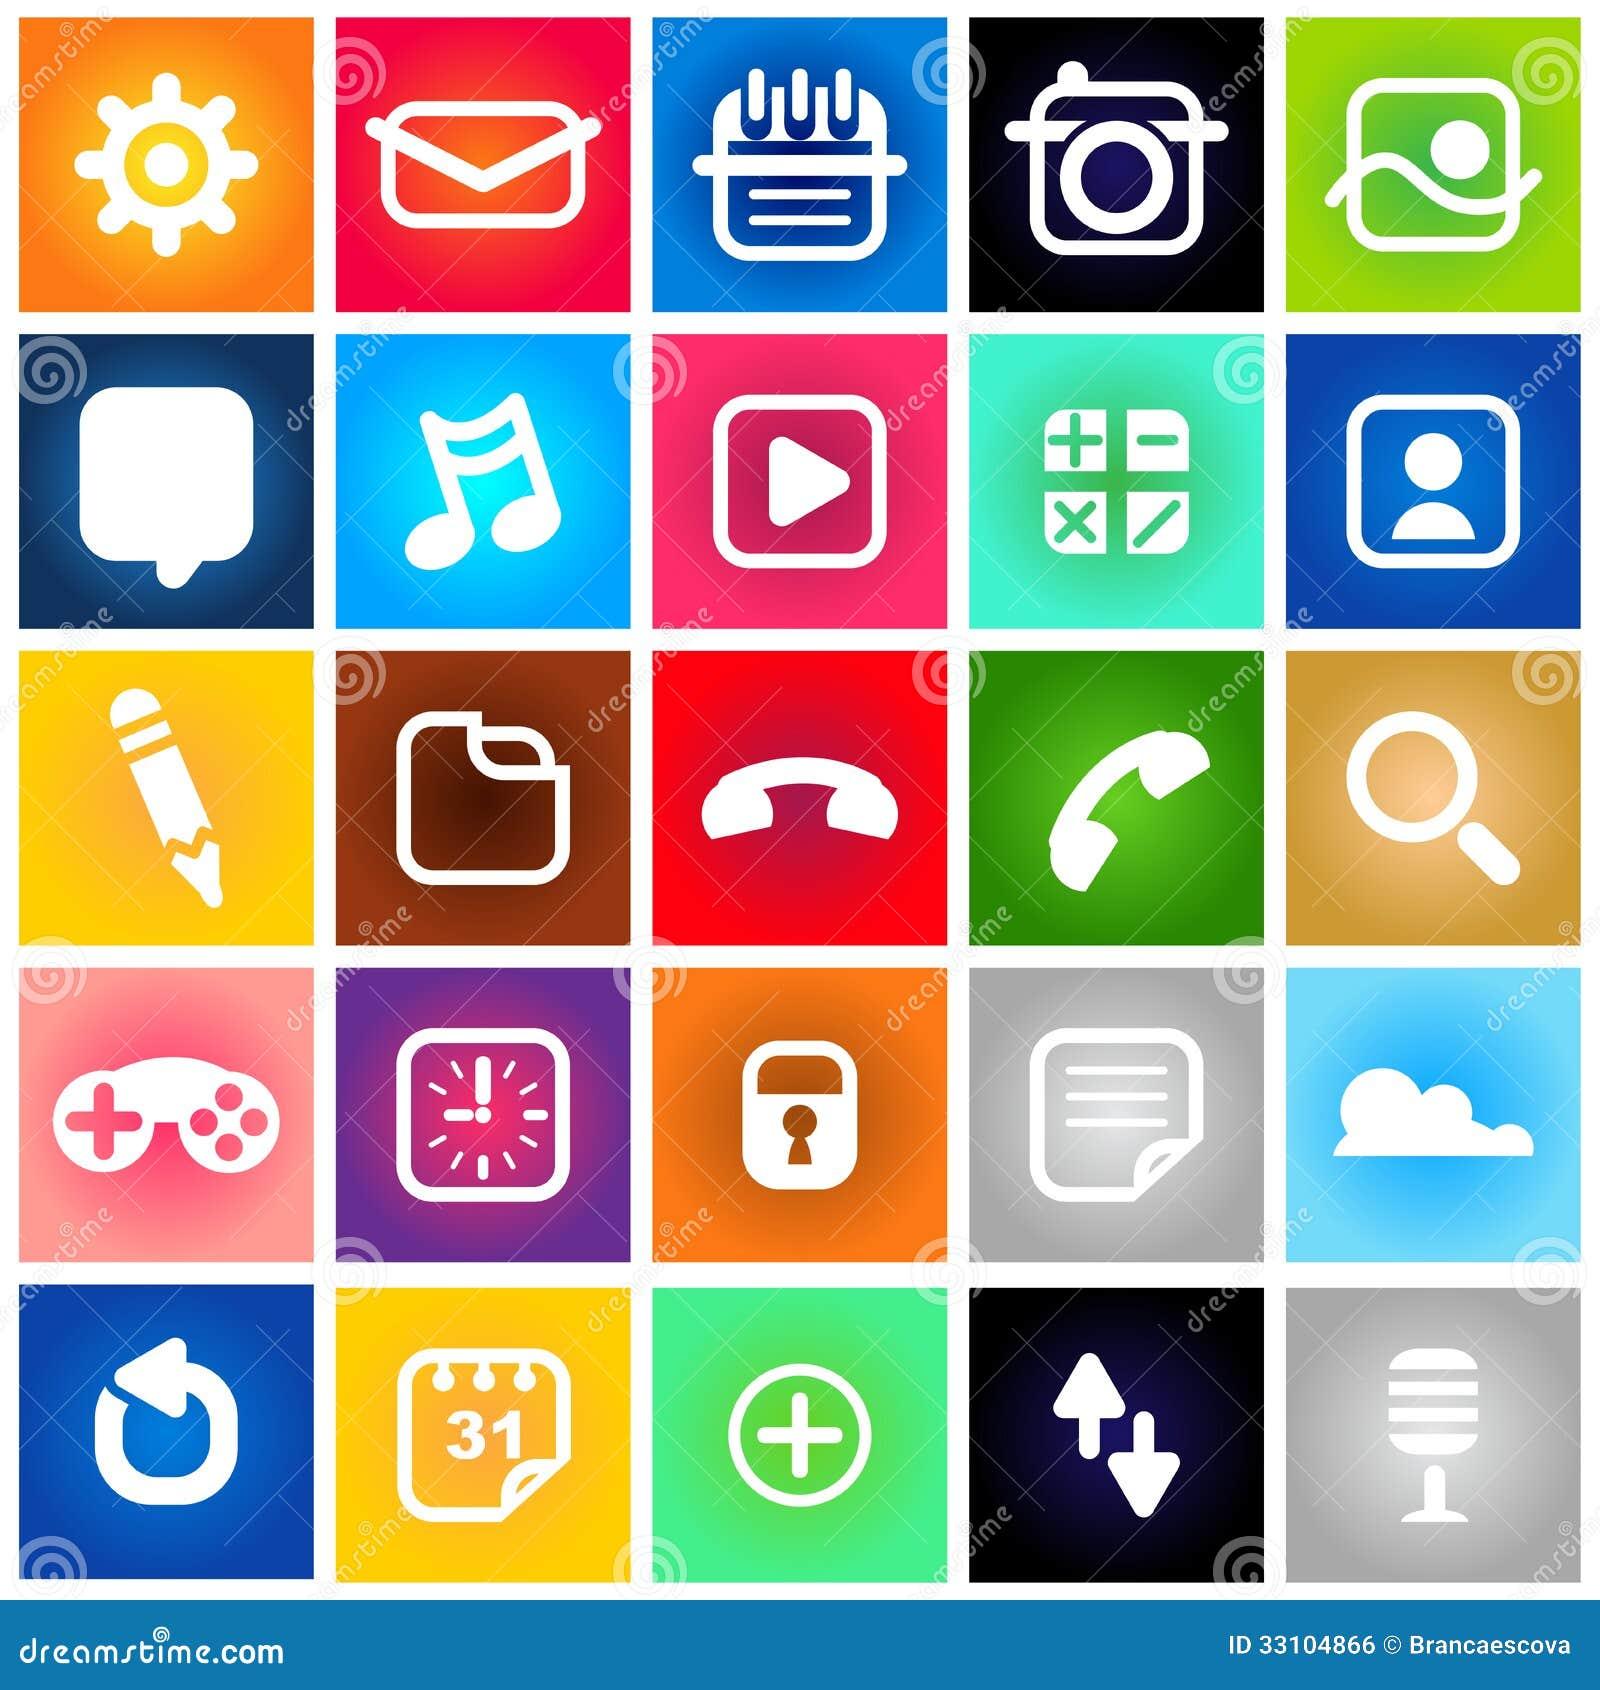 microsoft clip gallery download